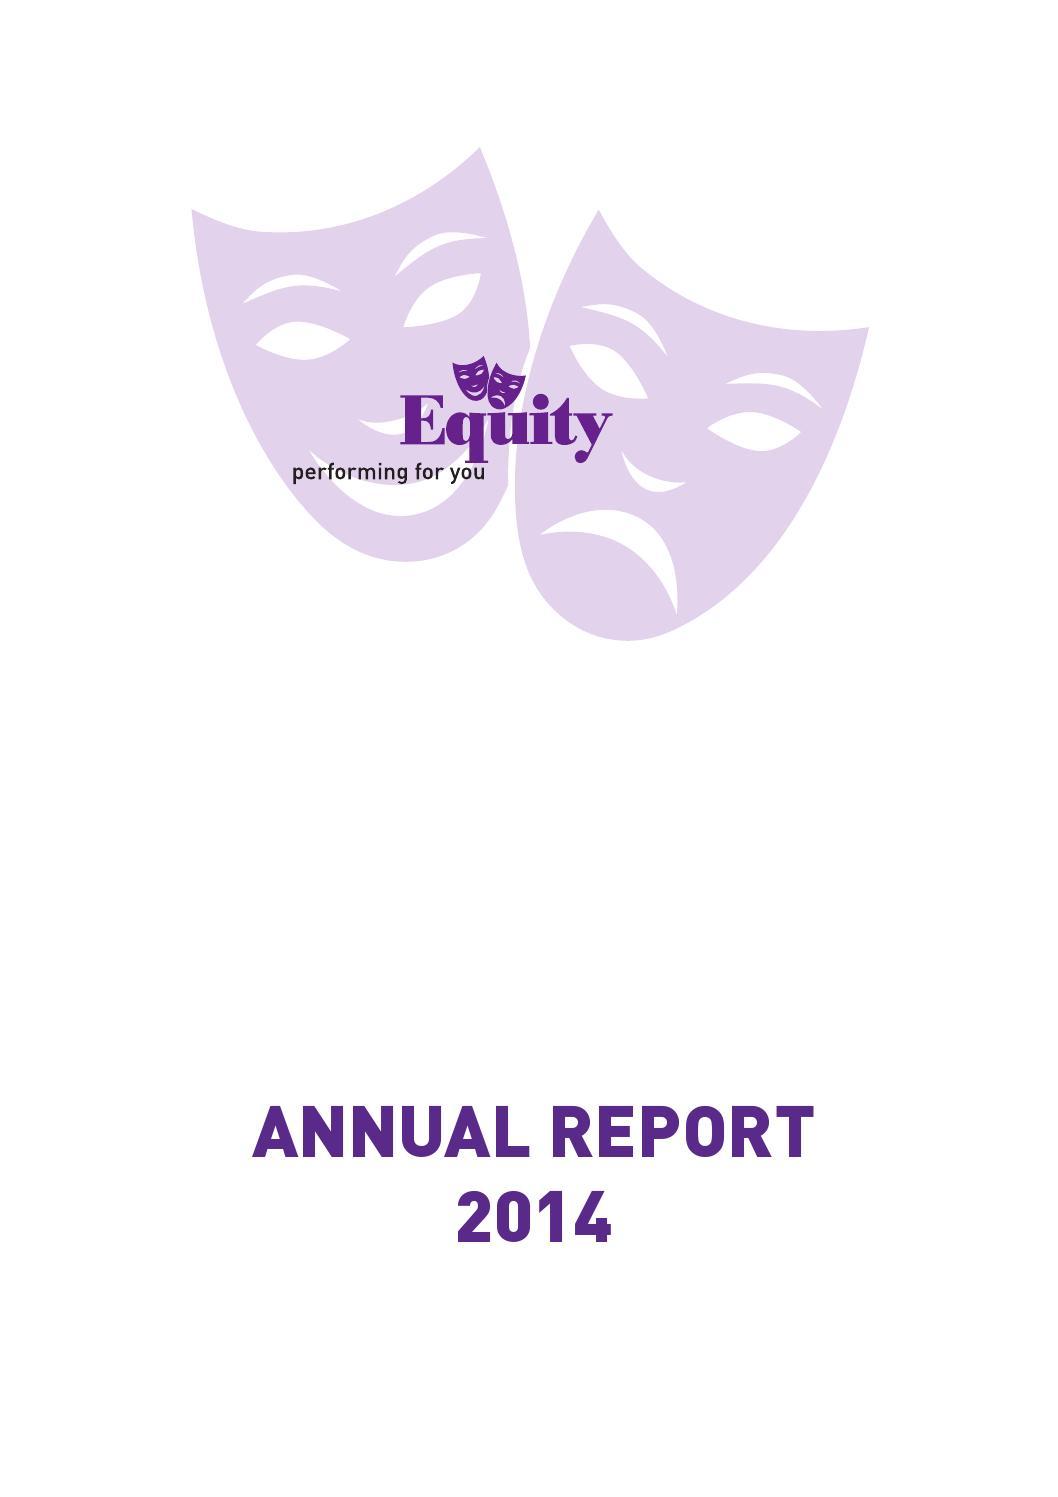 2014 EquityUK Annual Report by Caron Lyon - issuu